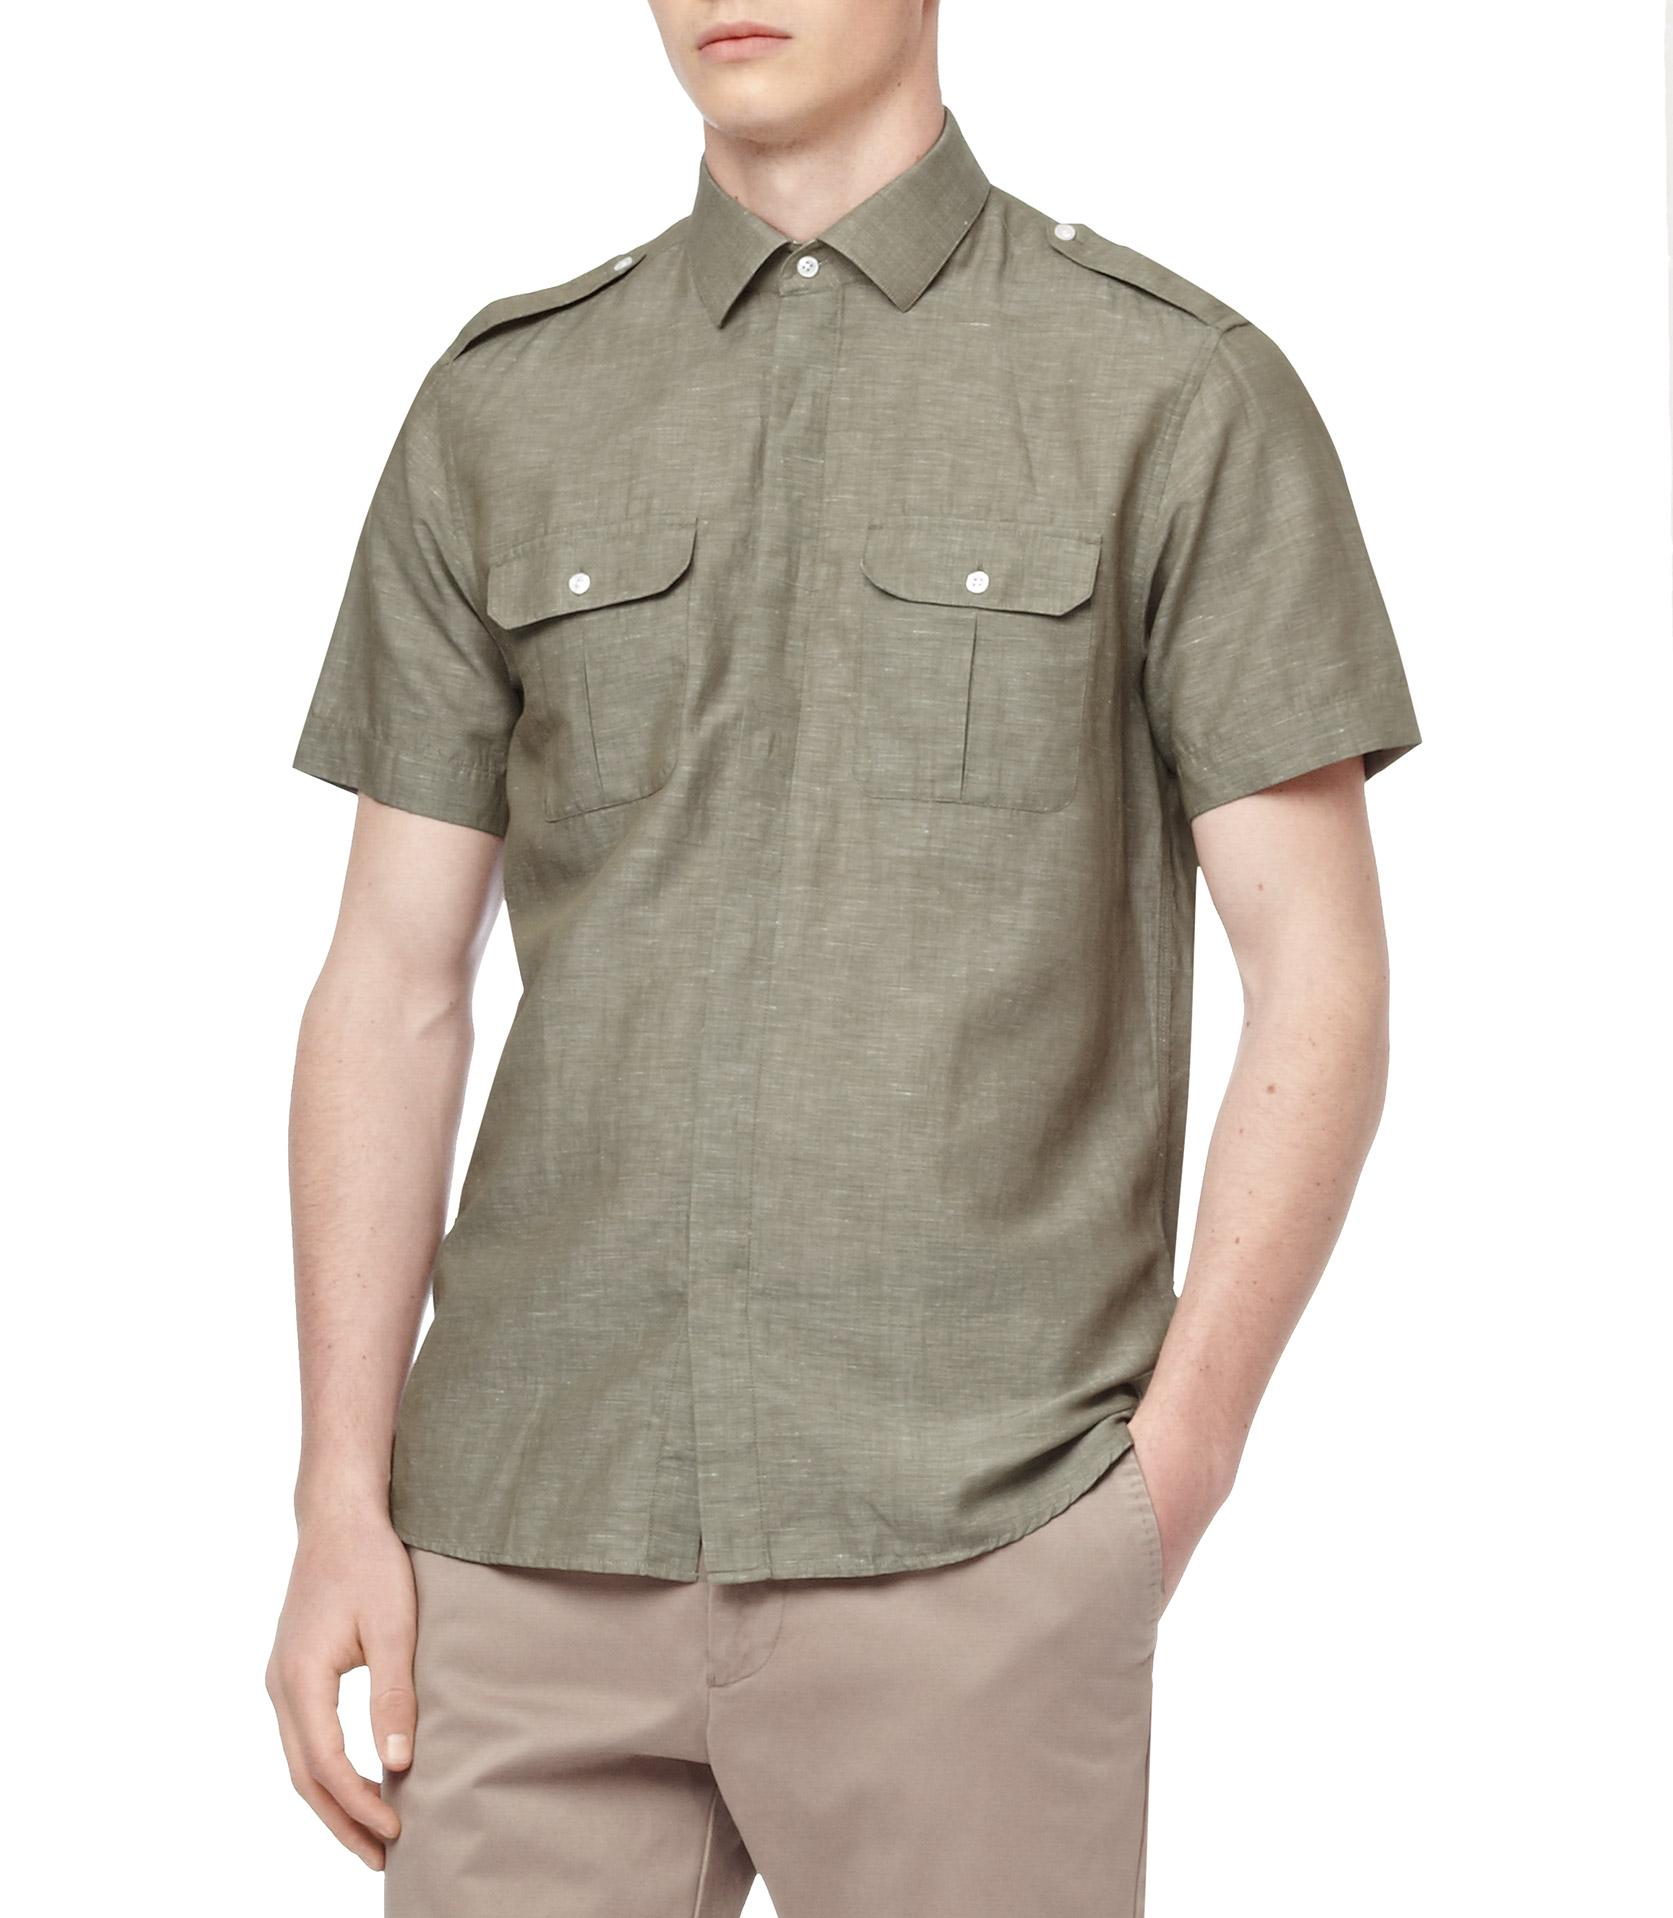 Reiss Amazon Short Sleeve Two Pocket Safari Shirt In Green